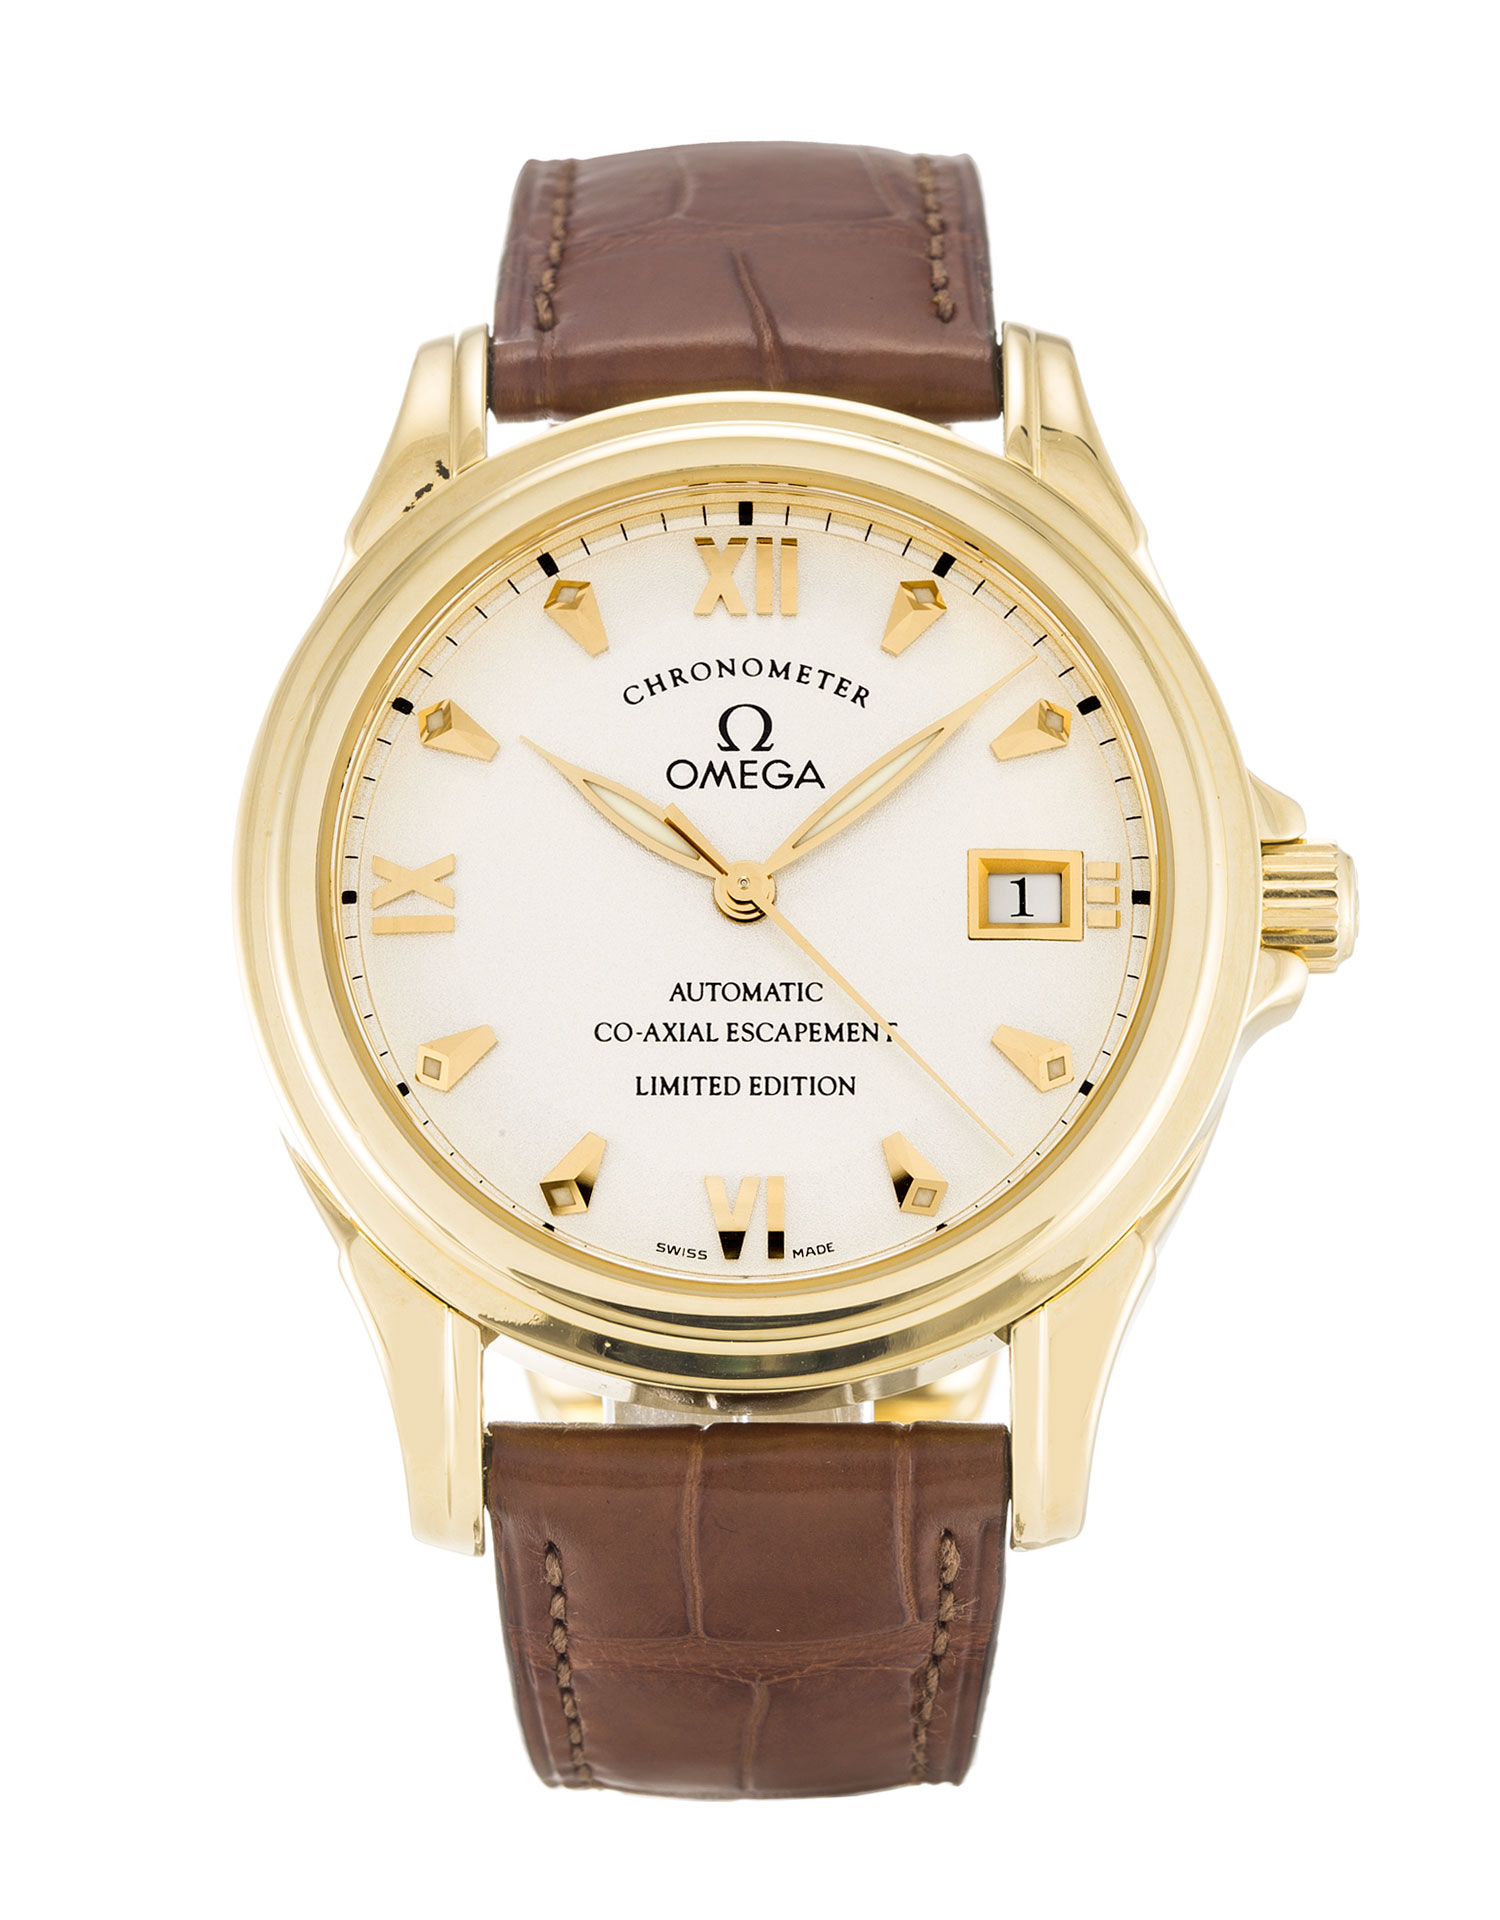 Breitling Watches Watchfinder Images Superocean